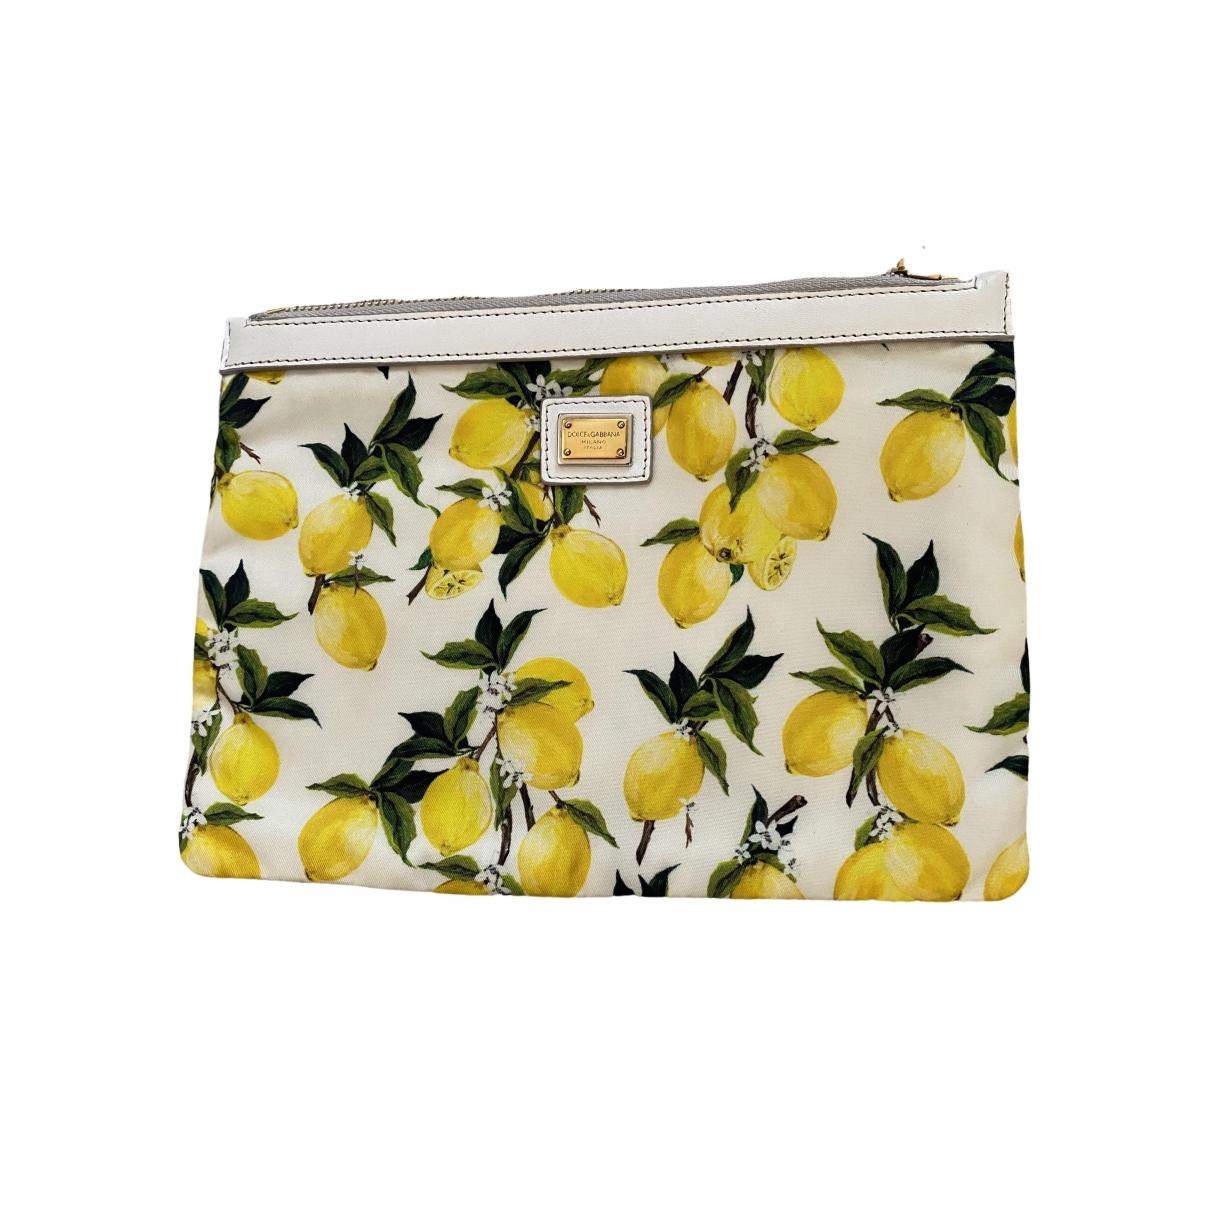 Dolce & Gabbana \N Multicolour Cloth Clutch bag for Women \N